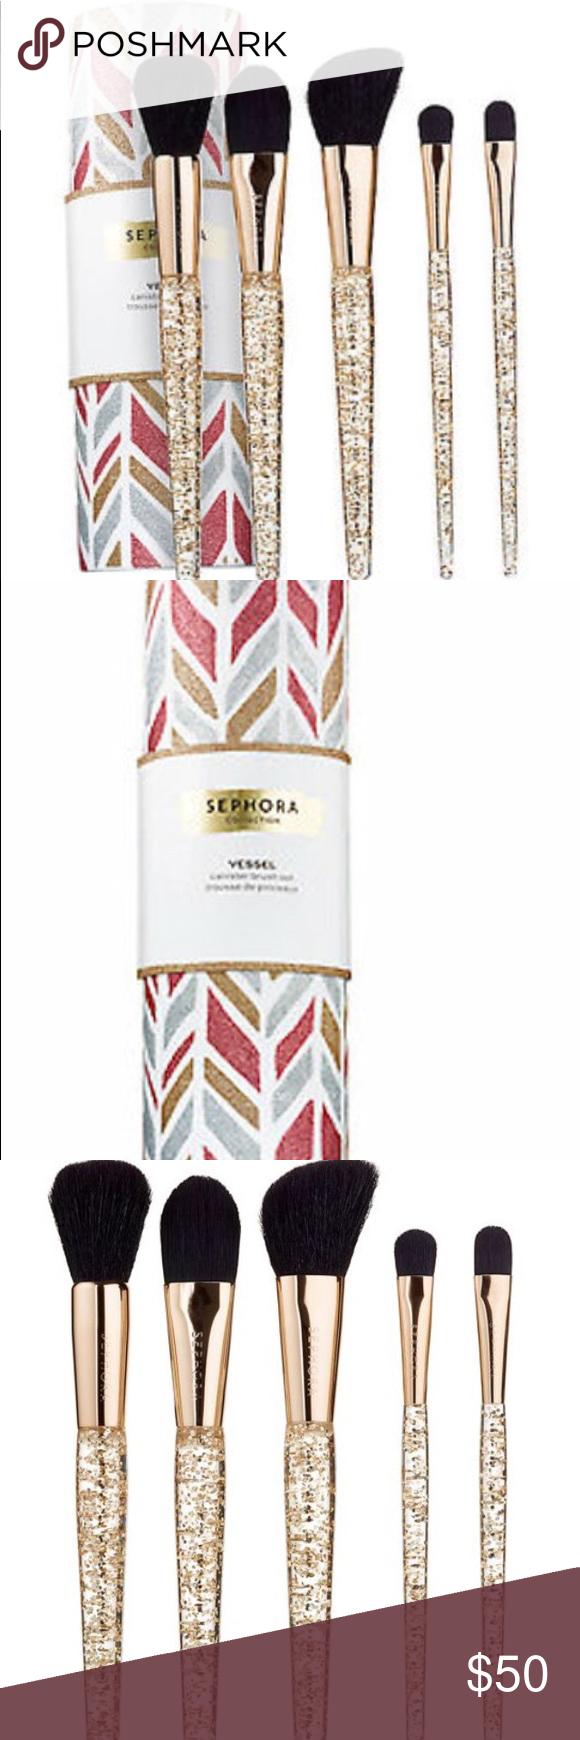 Sephora Sparkle & Shine Glitter Brush Set W/Case NWT